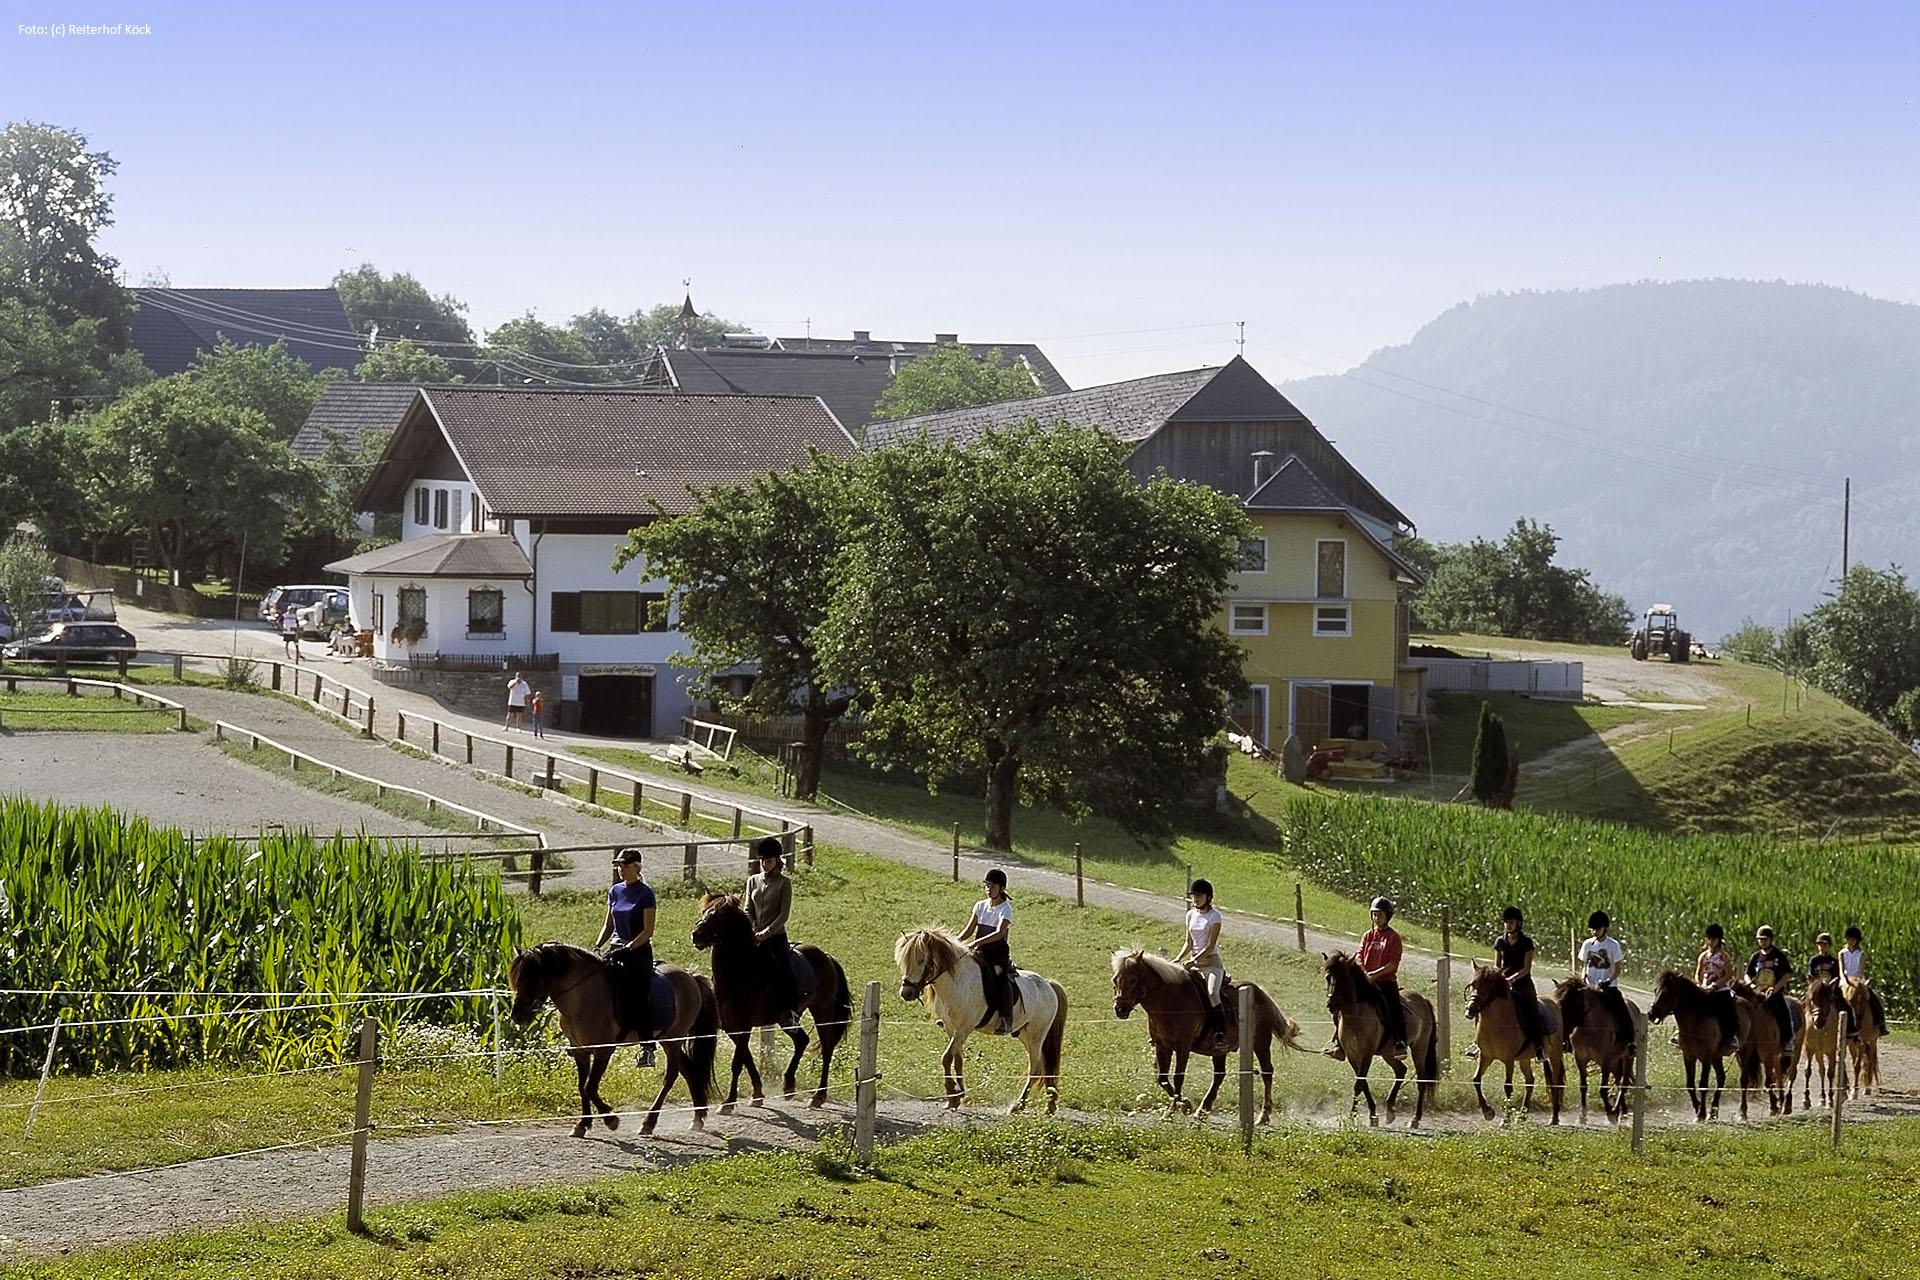 Hotels Nahe Baden Baden